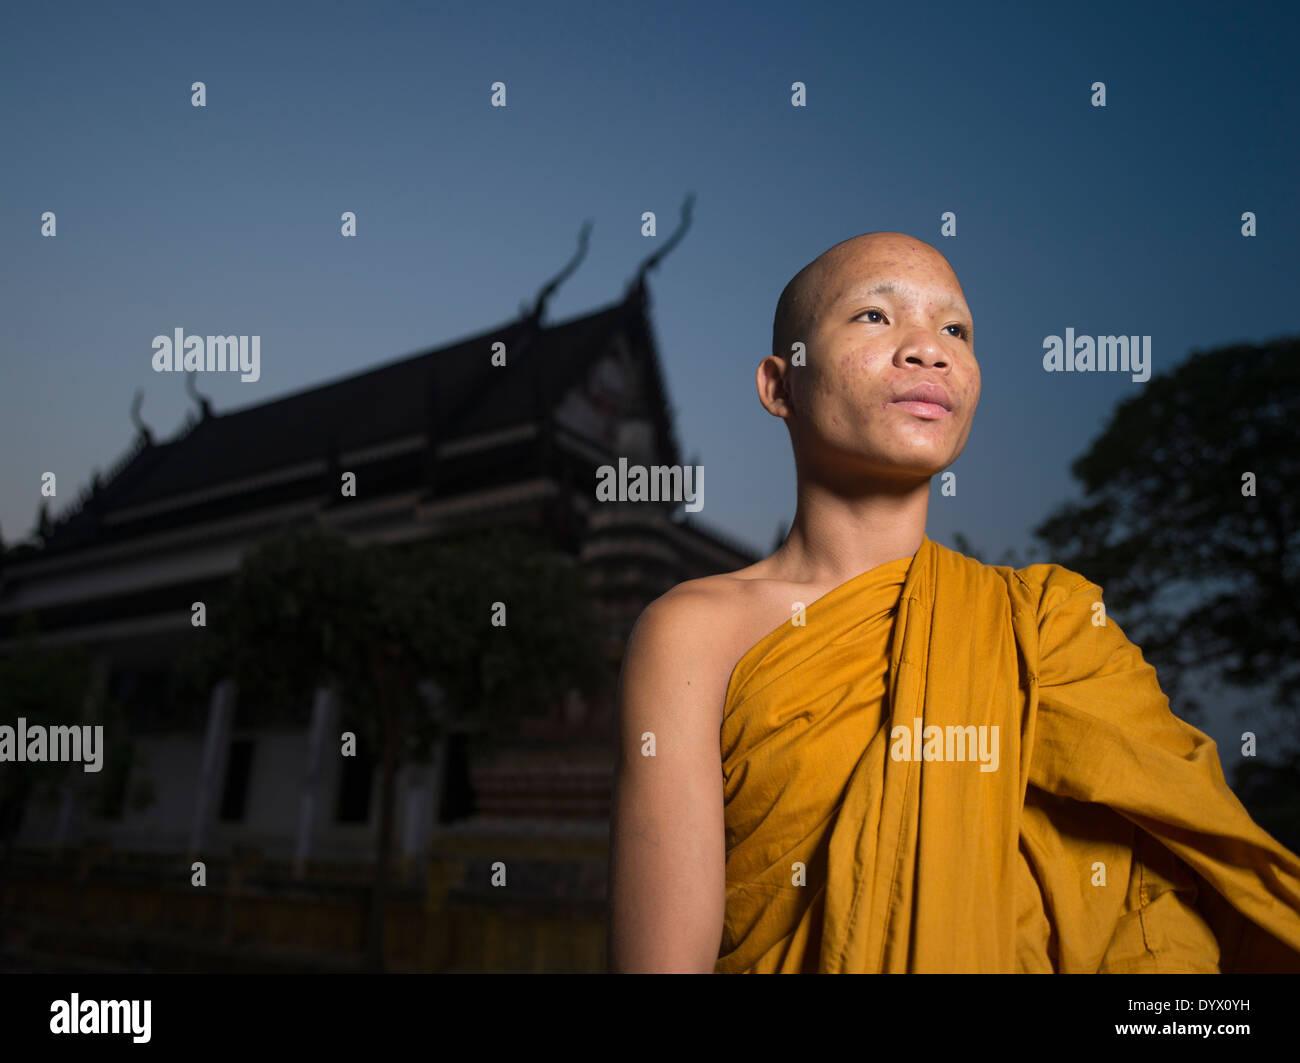 Moine Bouddhiste Cambodgien à Angkor Wat Temple à l'aube, Siem Reap, Cambodge Photo Stock